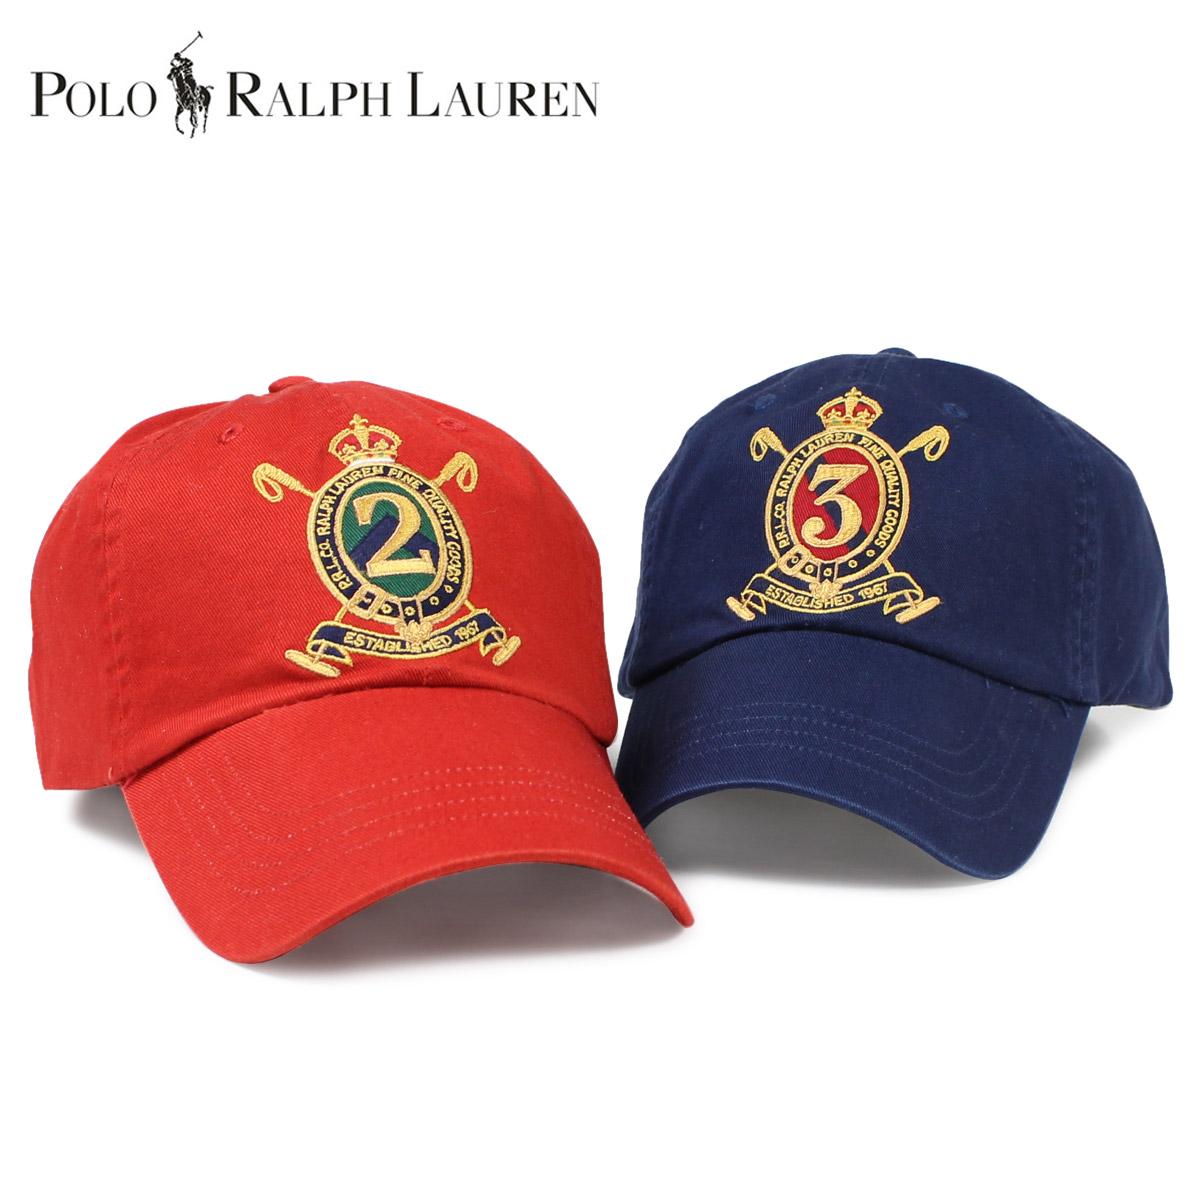 ALLSPORTS  Ralph Lauren Hat mens Cap POLO RALPH LAUREN COTTON TWILL SPORTS  CAP ladies  11   8 new in stock   490c7bcd747